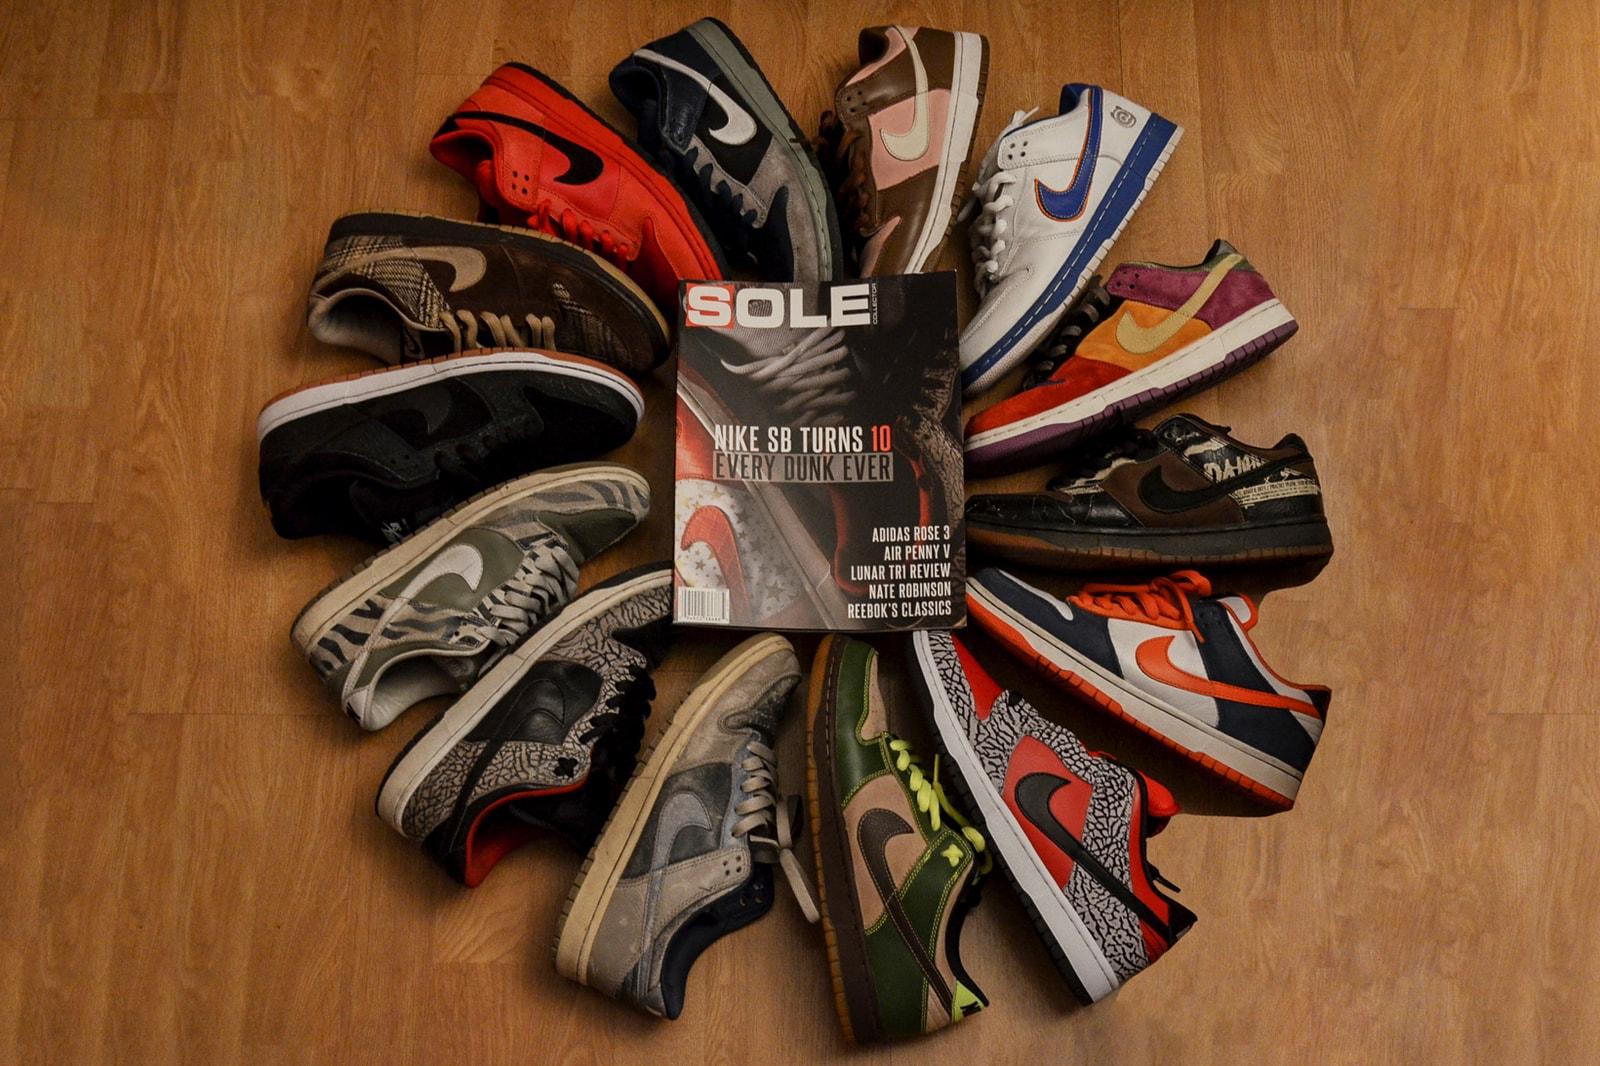 ebb9c9d29ce17 Nike SB Skateboarding Sneakers Forums Trends August Benzien Kevin Imamura  Supreme Medicom Tiffany Stussy Jedi Zoo